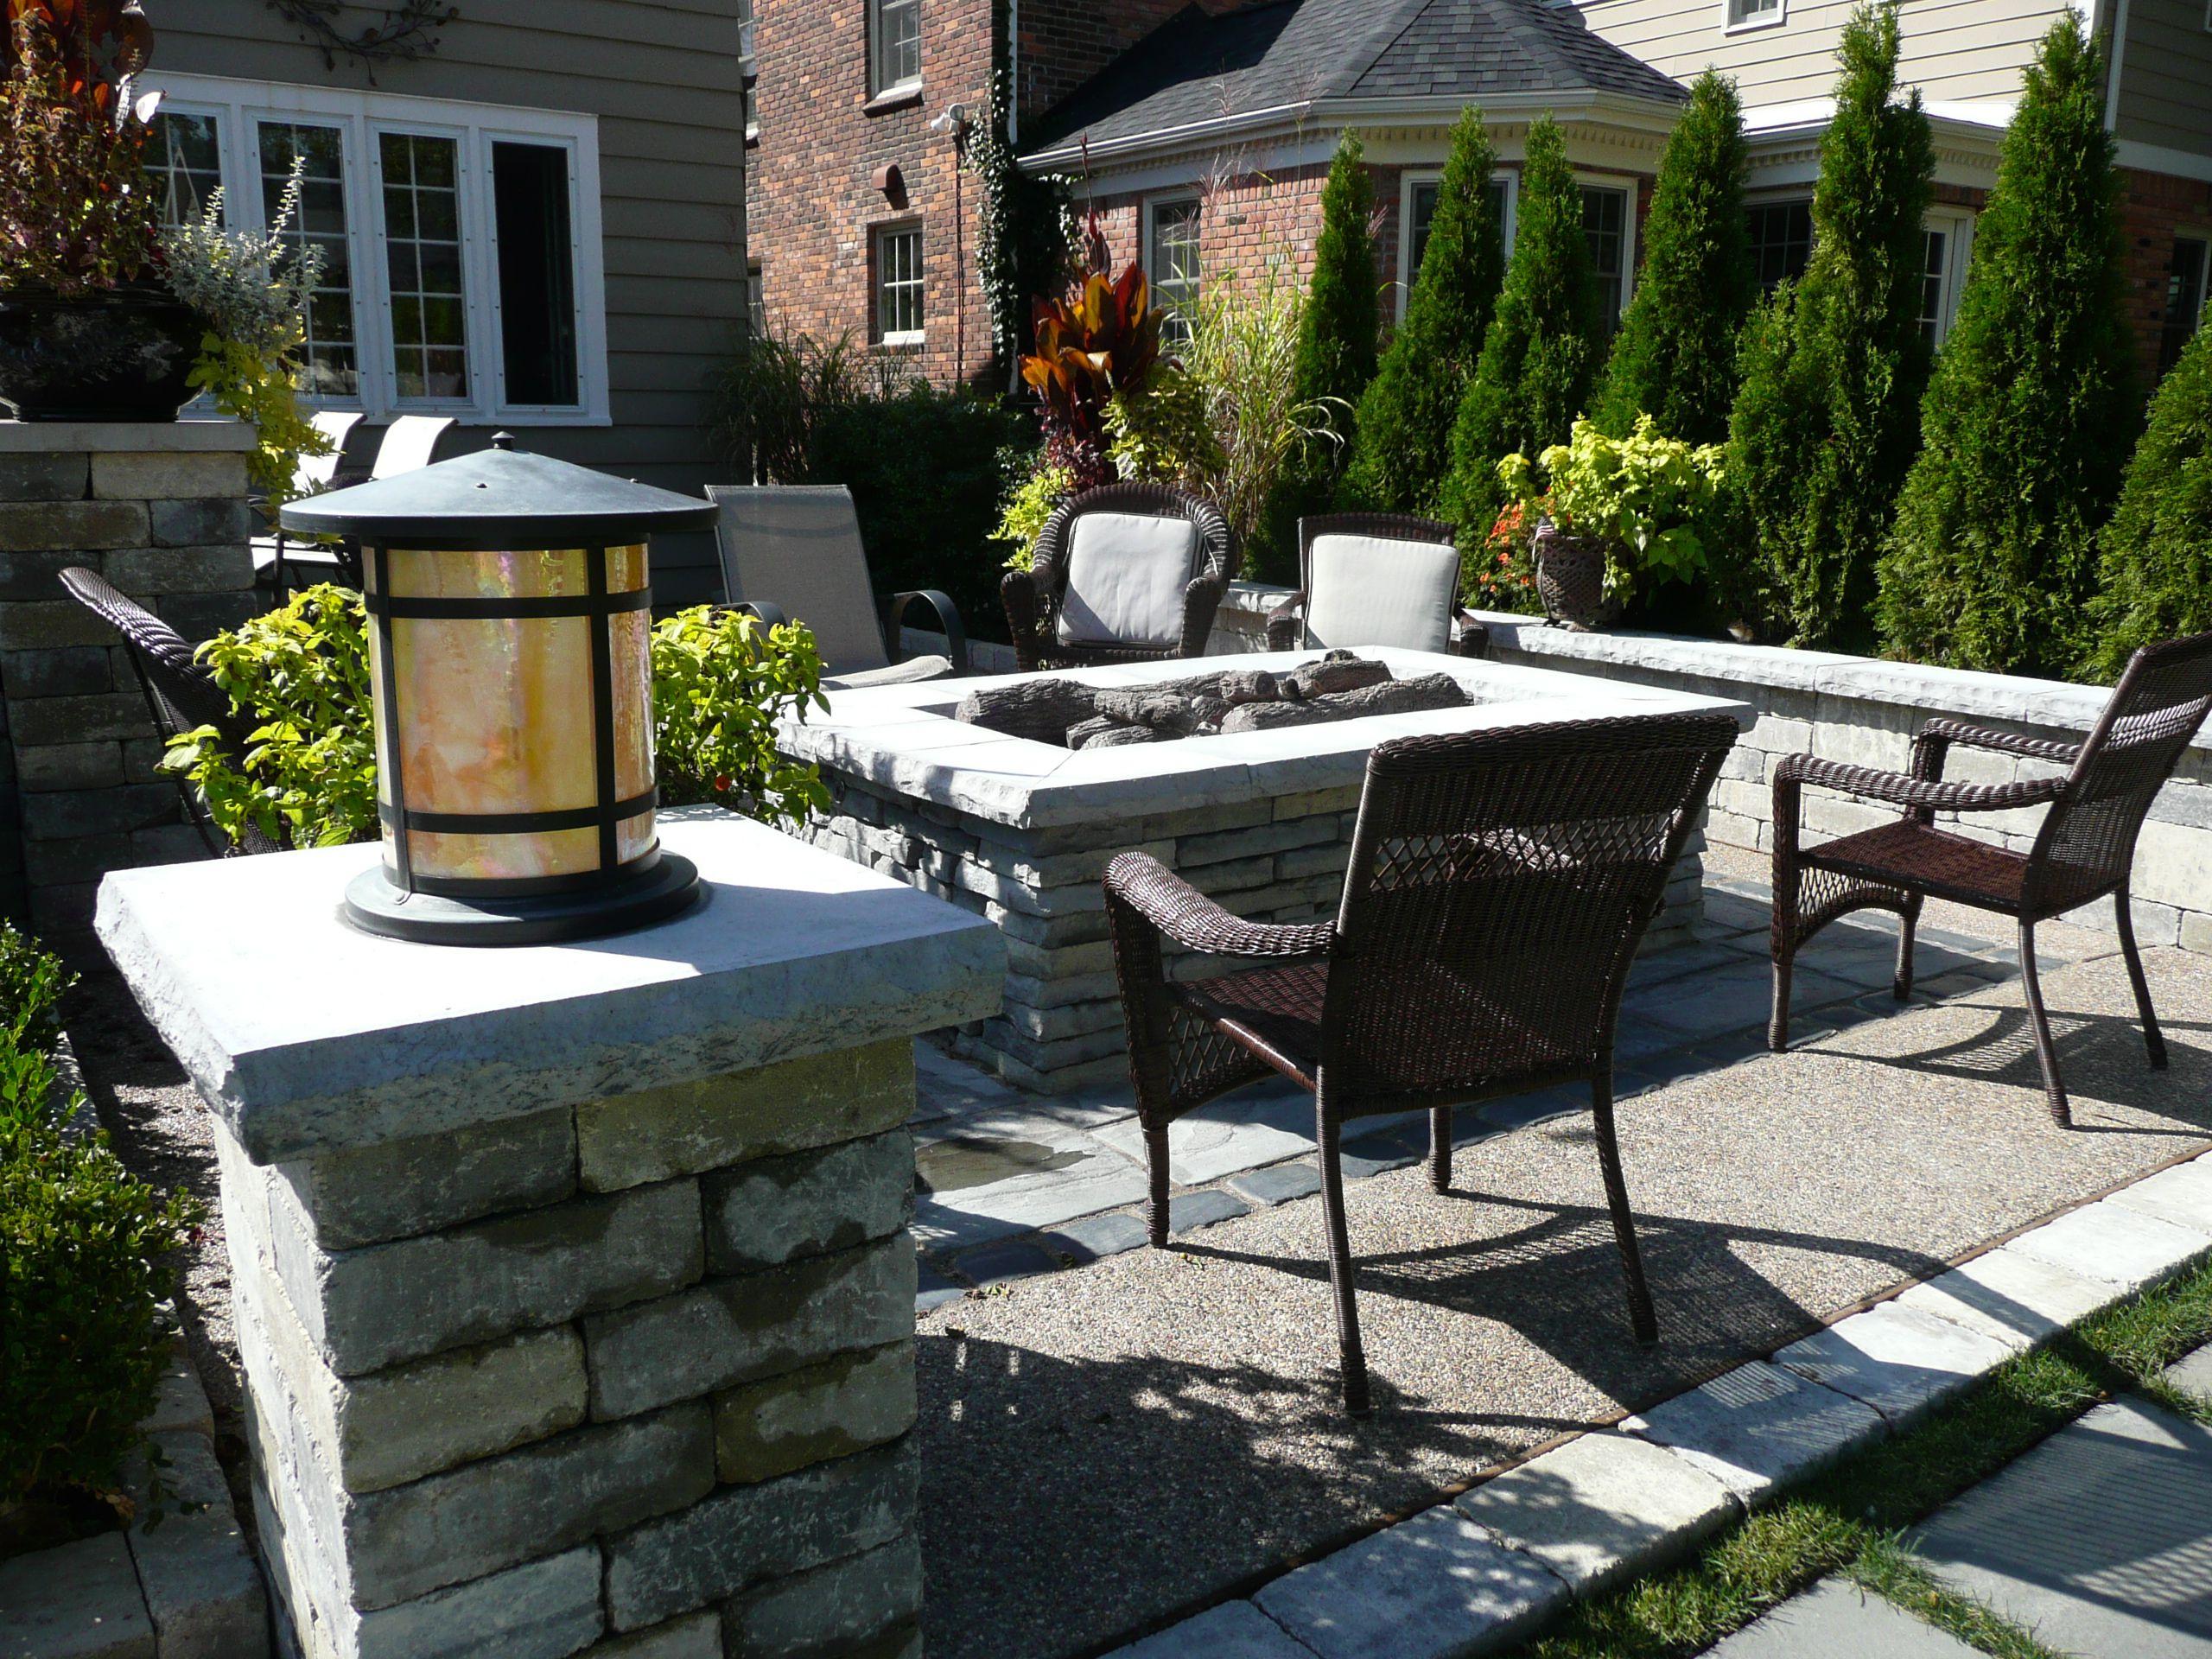 Backyard Gas Fire Pit Designs : Back yard patio with gas fire pit  Landscape design ideas  Pintere